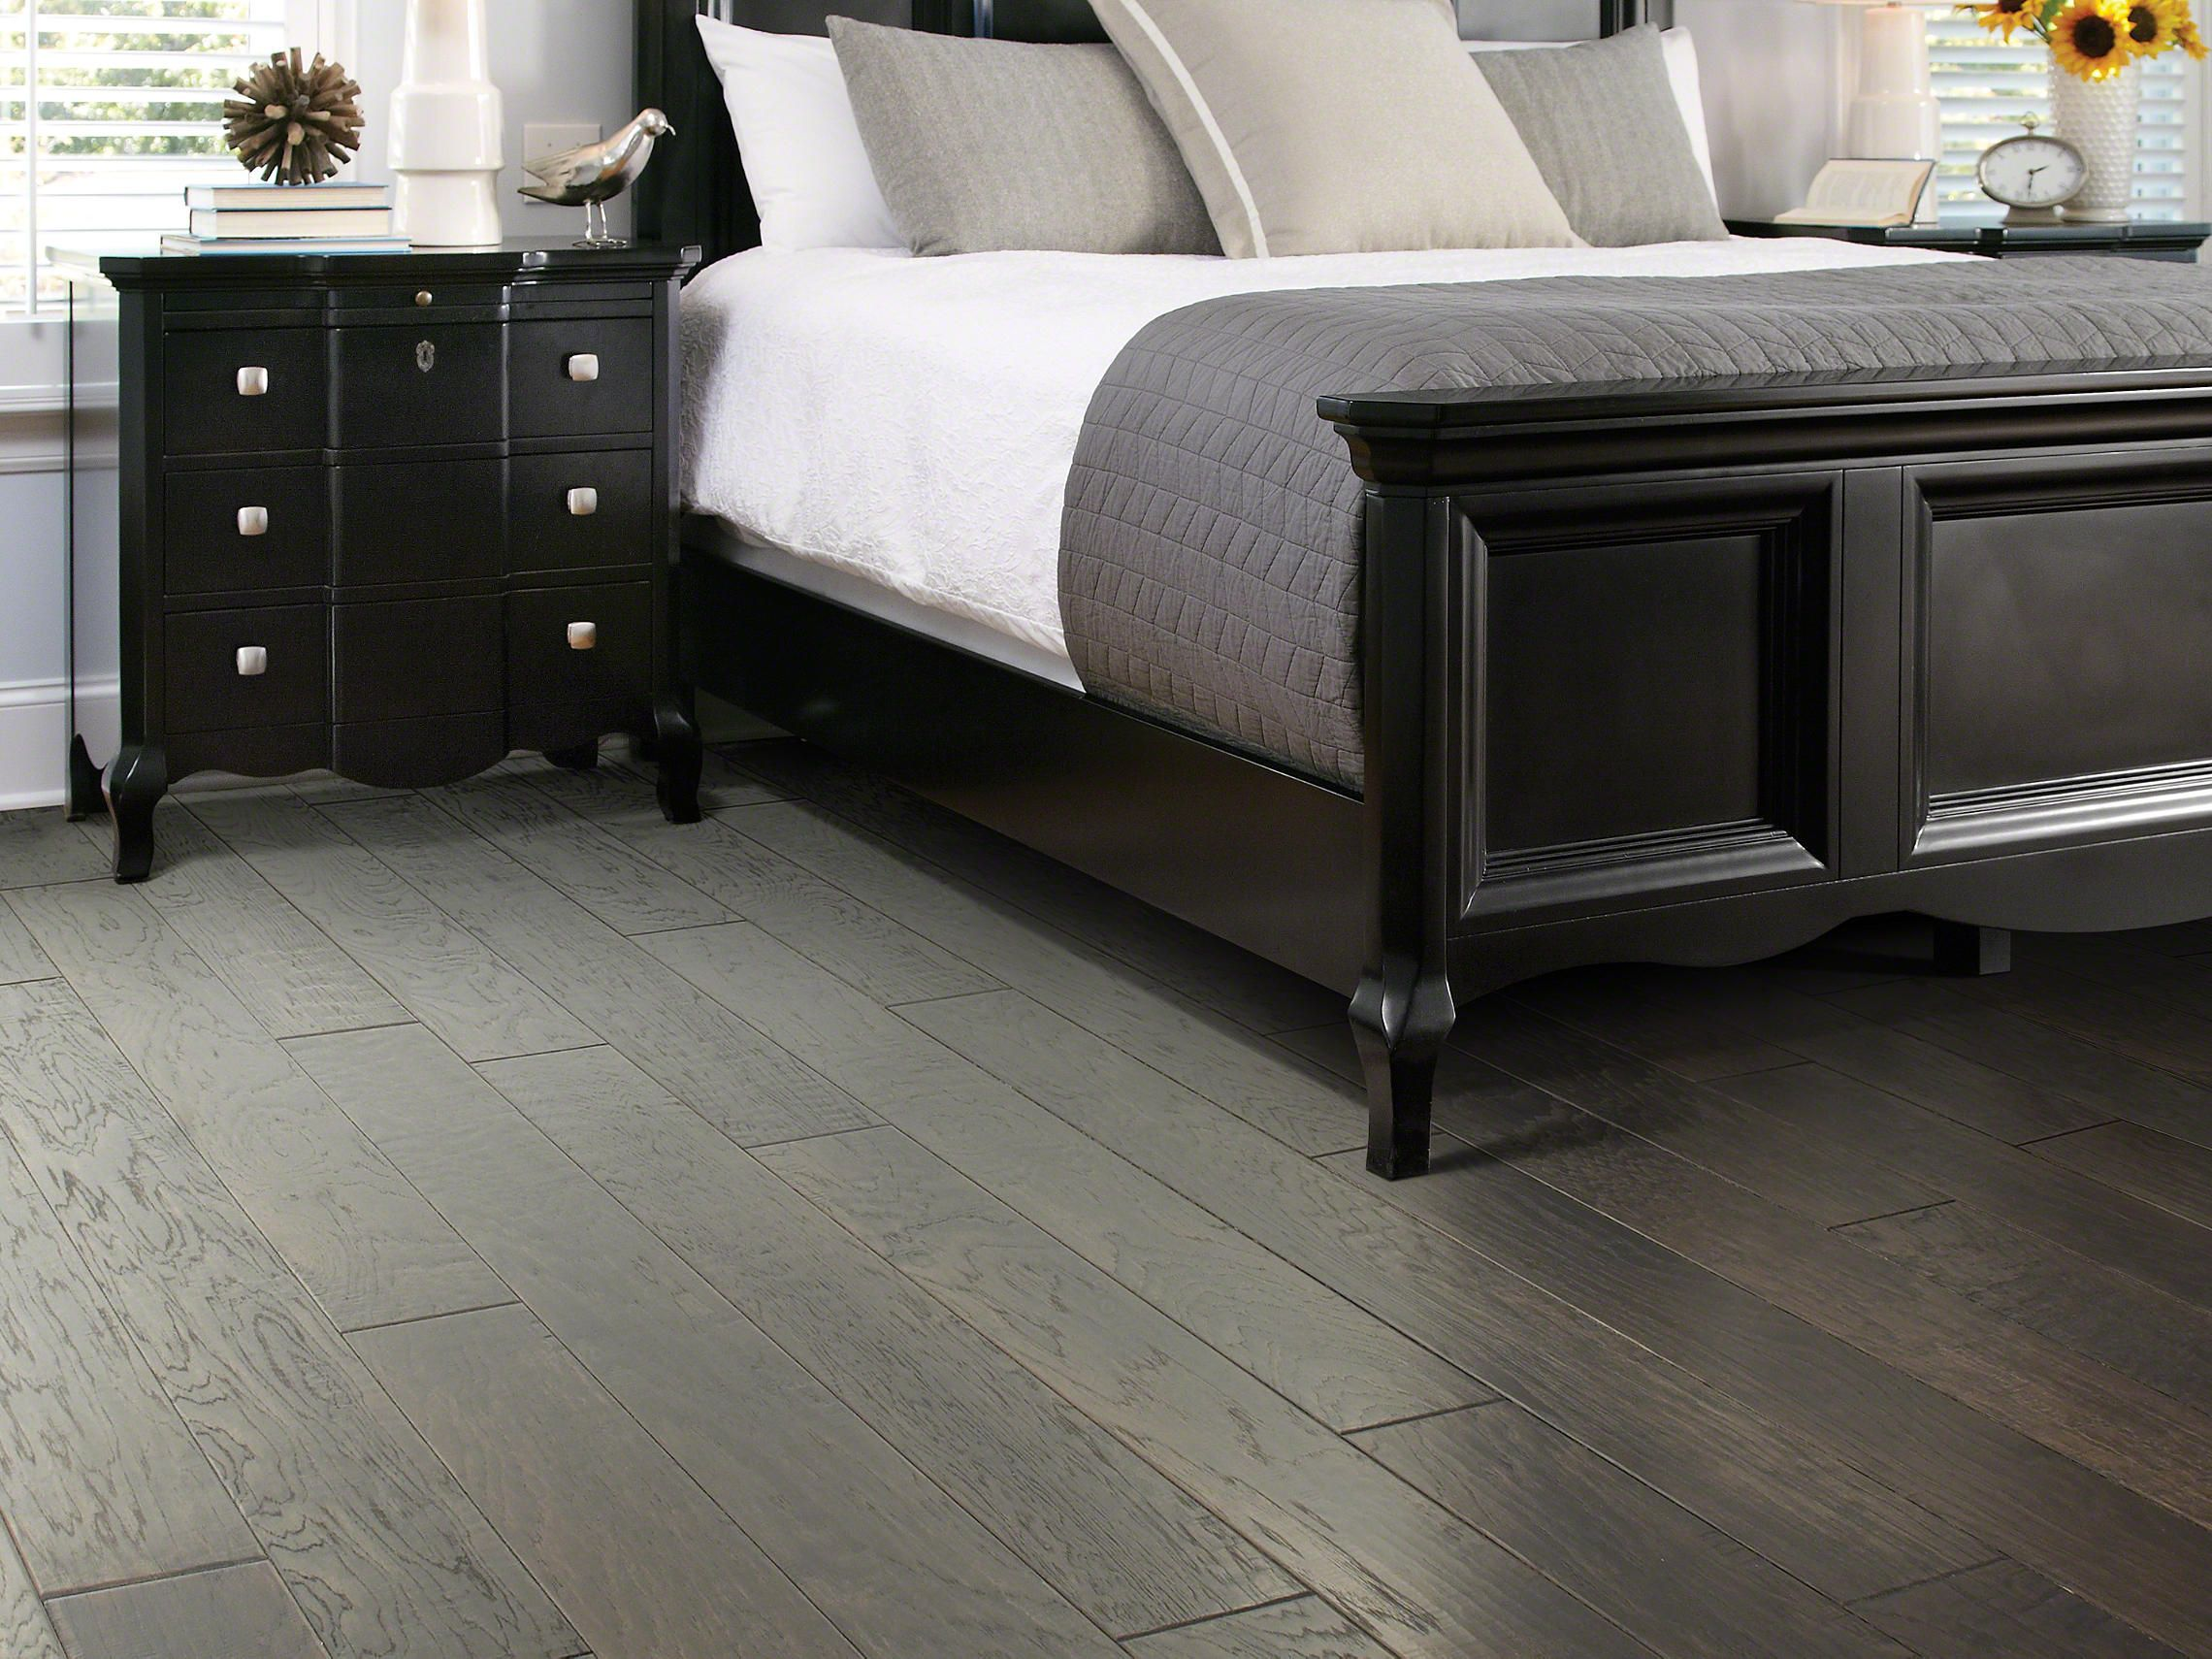 Grant Grove 6 3/8 Granite Luxury vinyl flooring